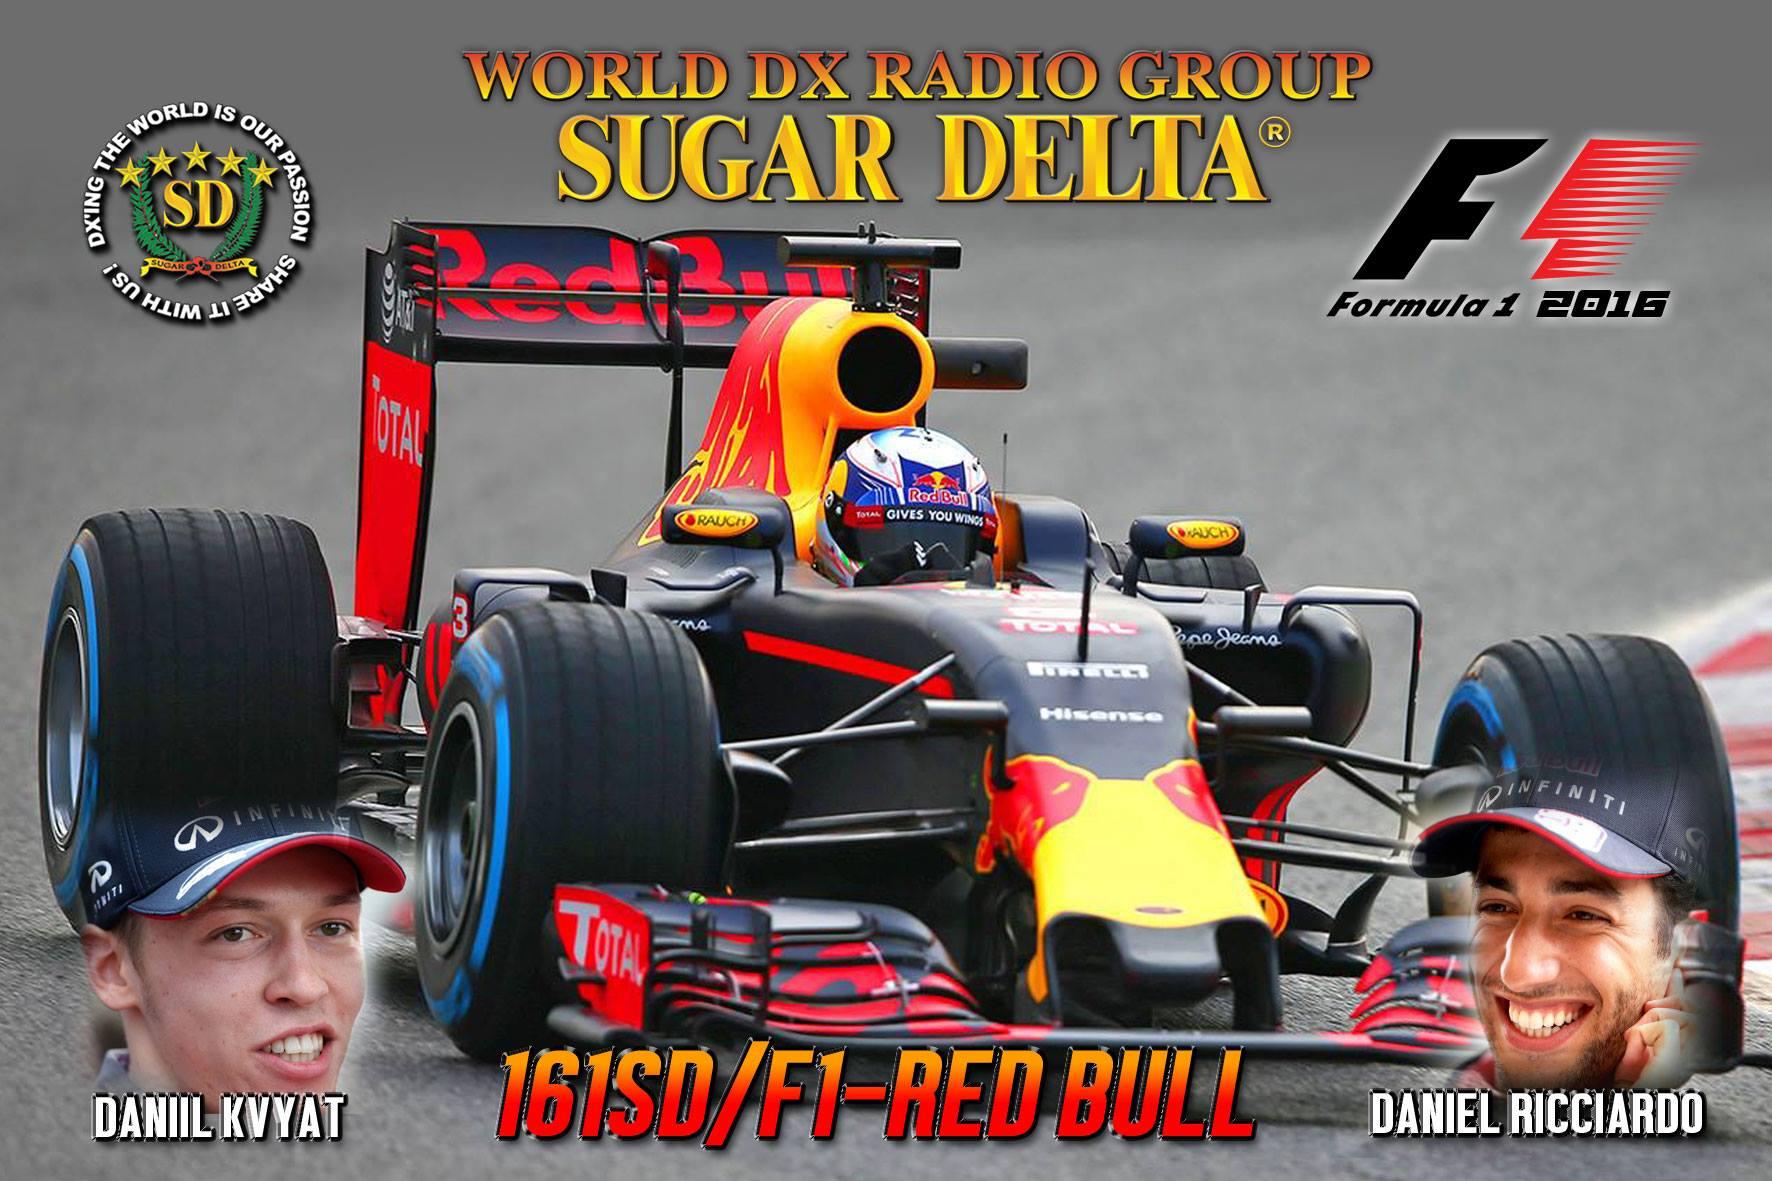 Sugar Delta Formula One